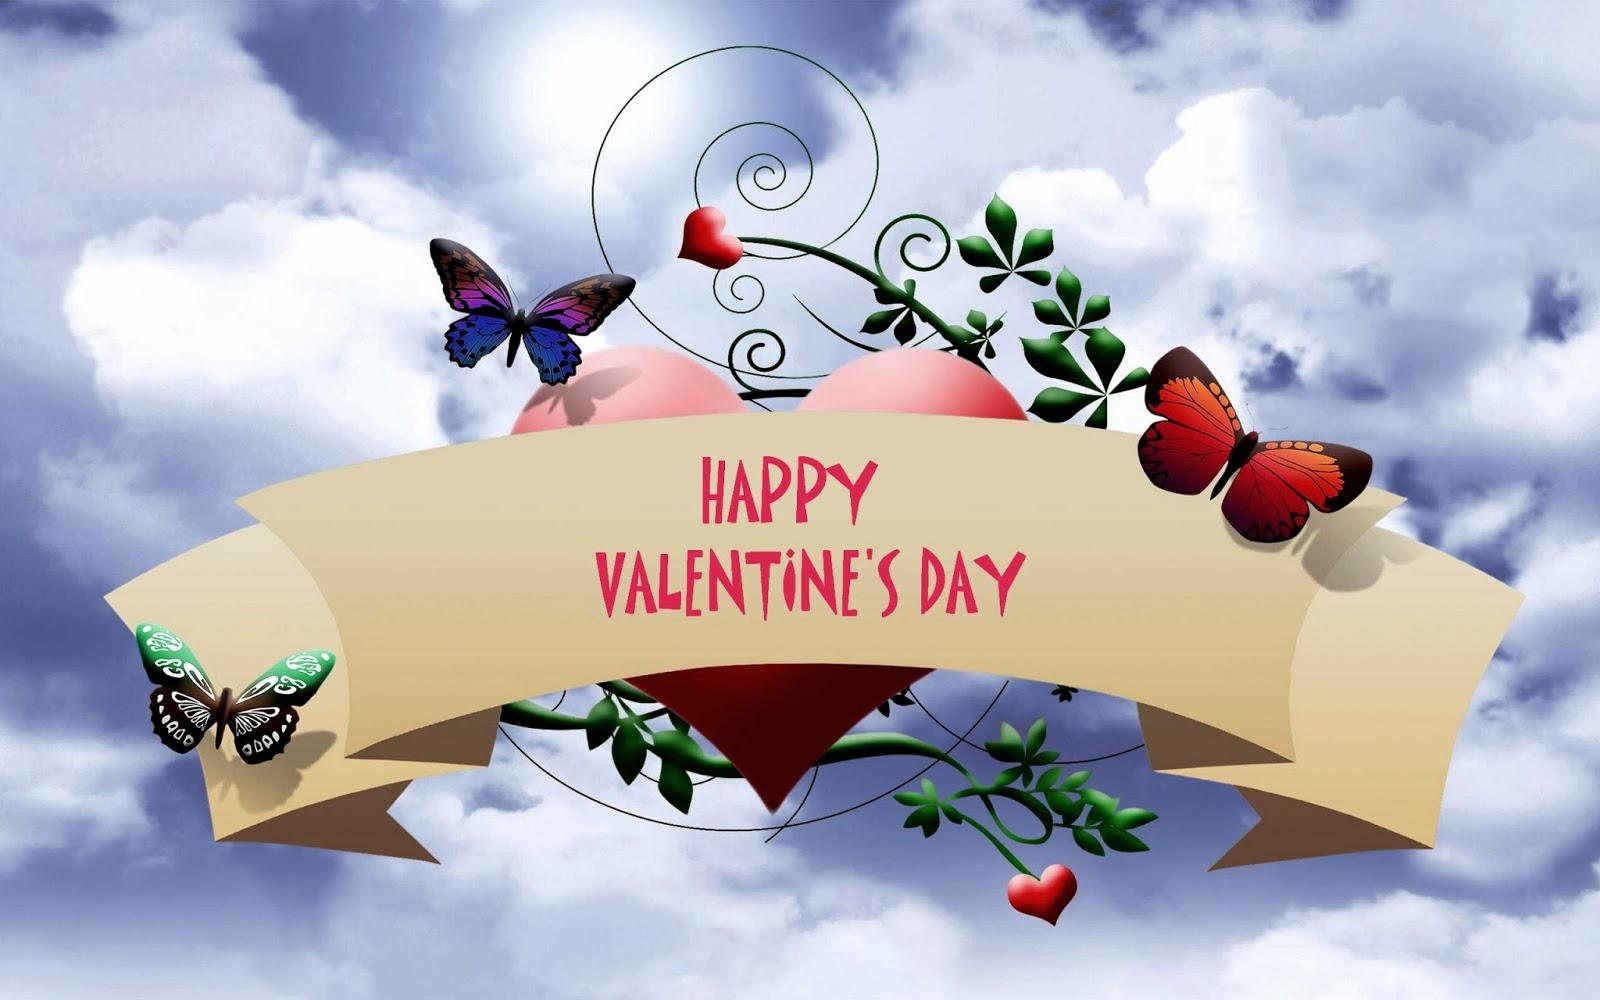 Desktop wallpapers free download happy valentine s day wallpaper